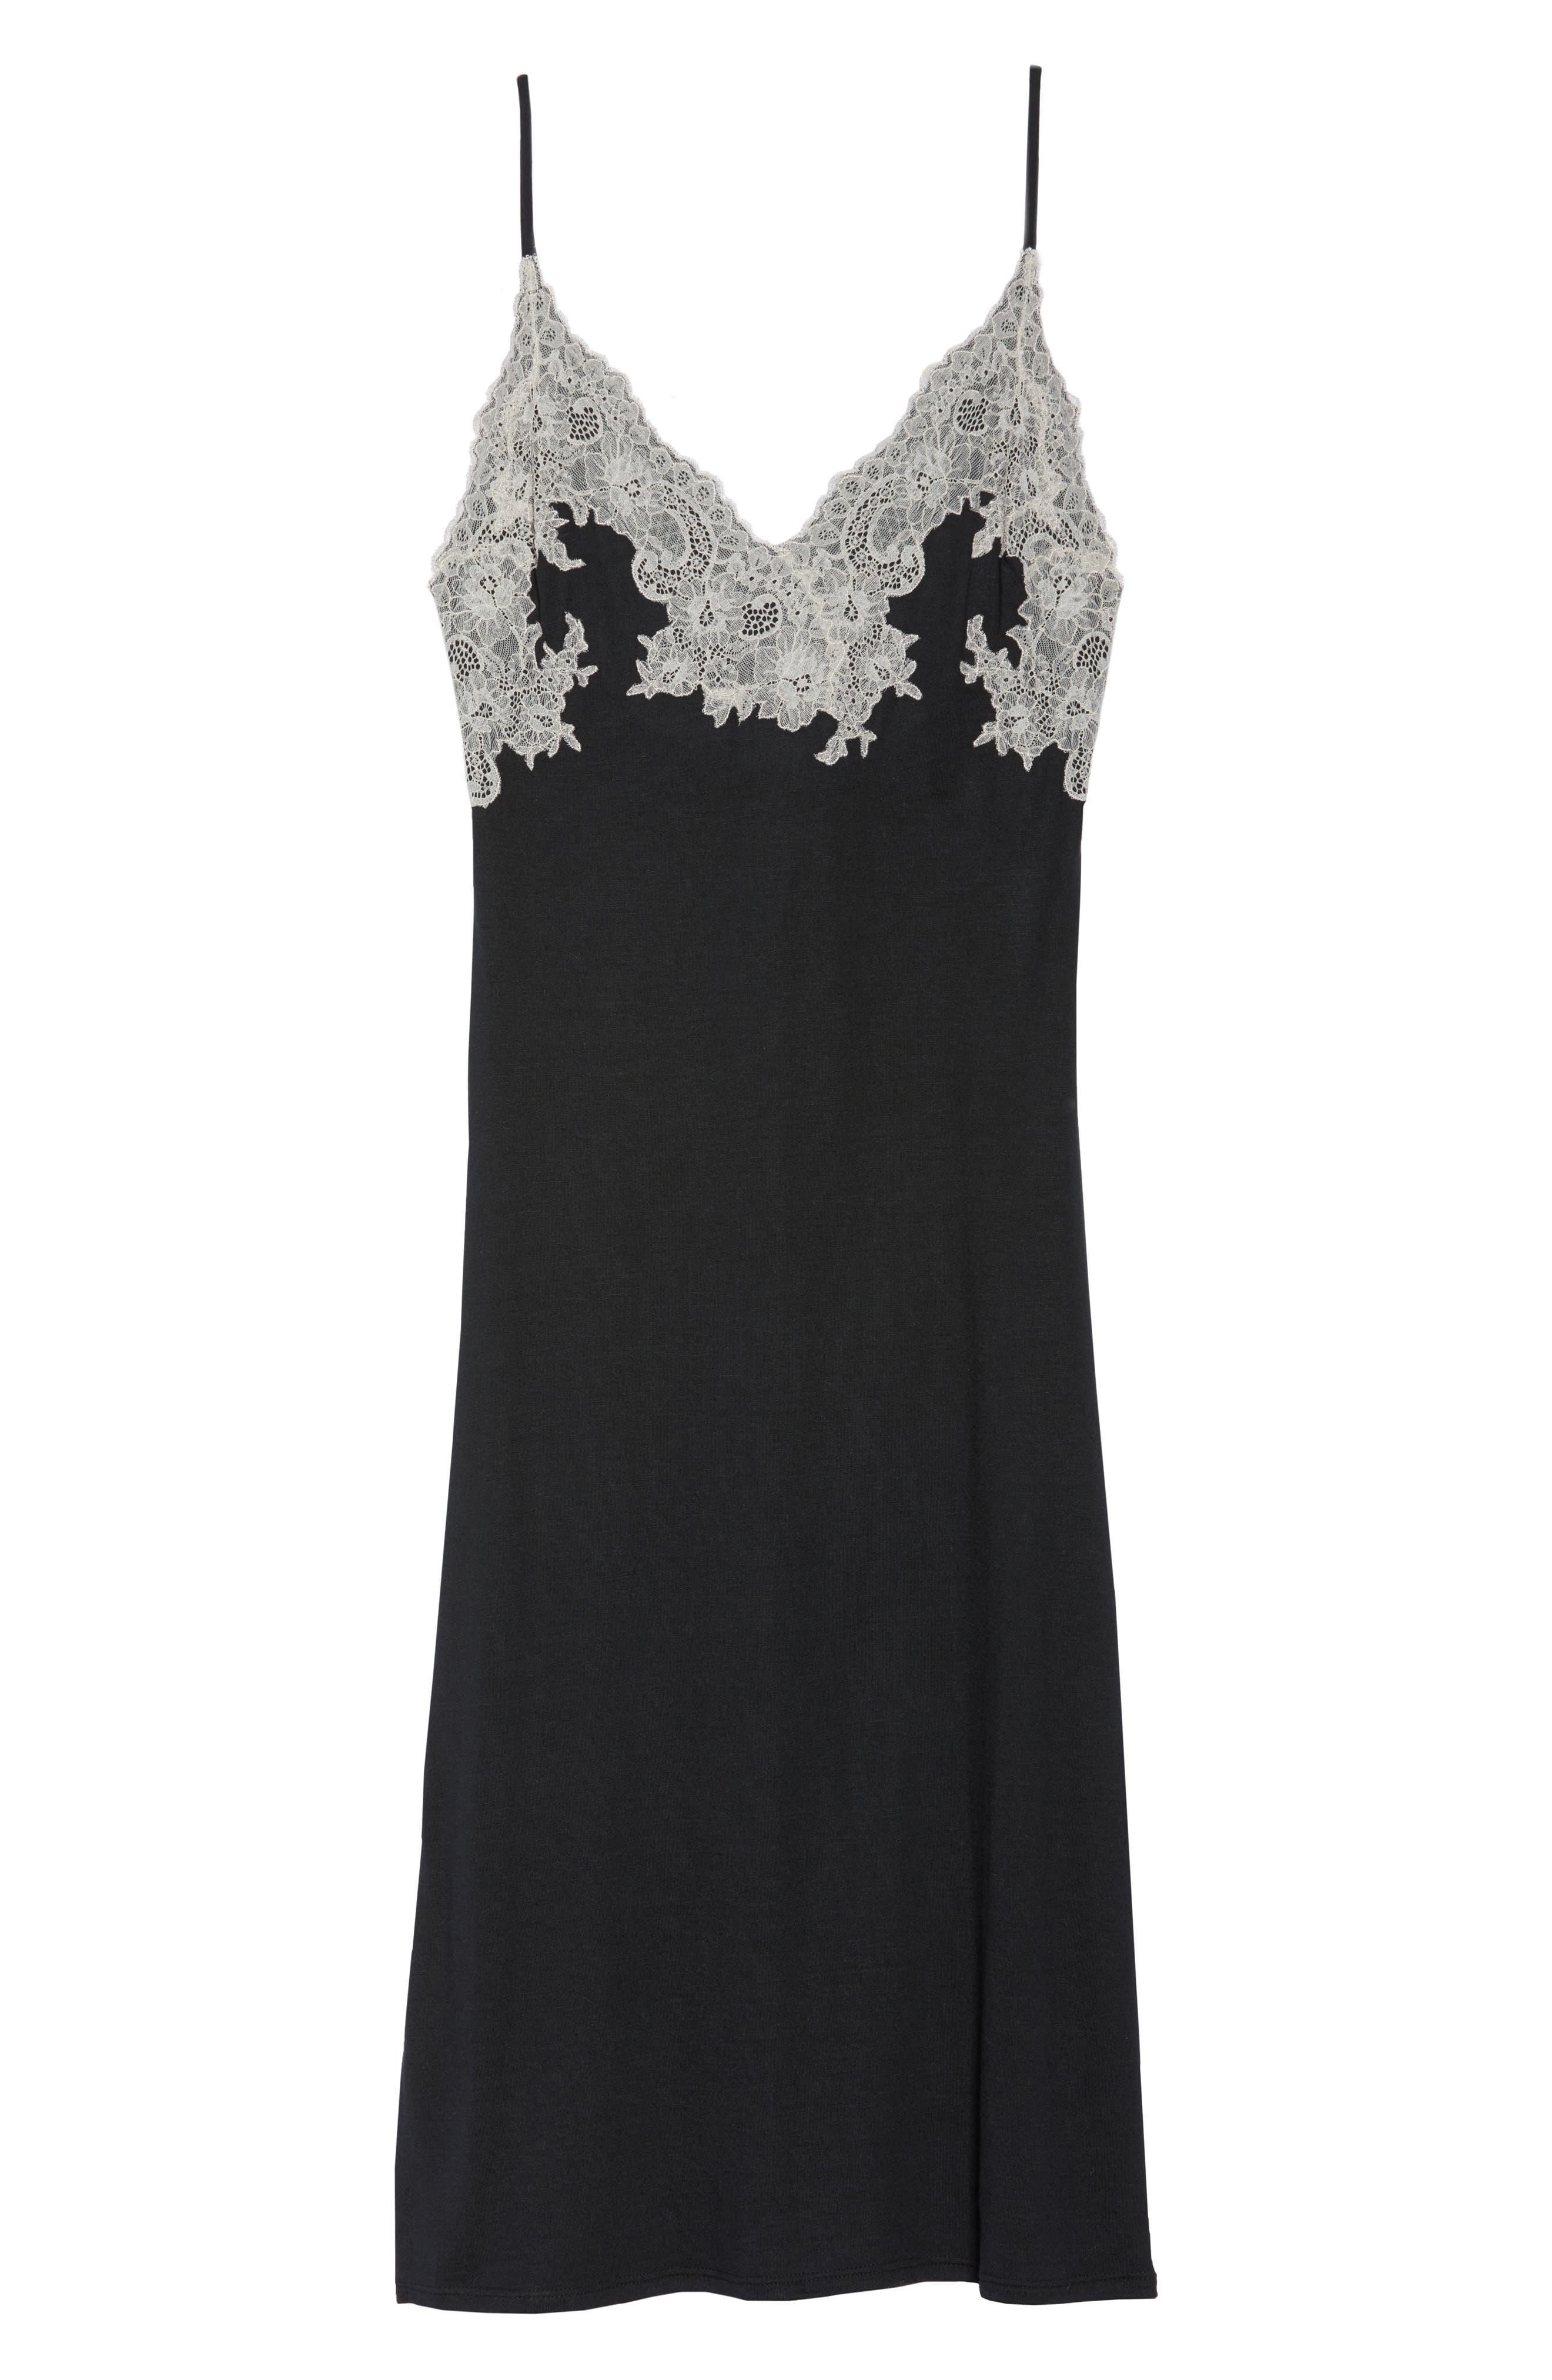 NATORI, Luxe Shangri-La Nightgown, Alternate thumbnail 6, color, BLACK